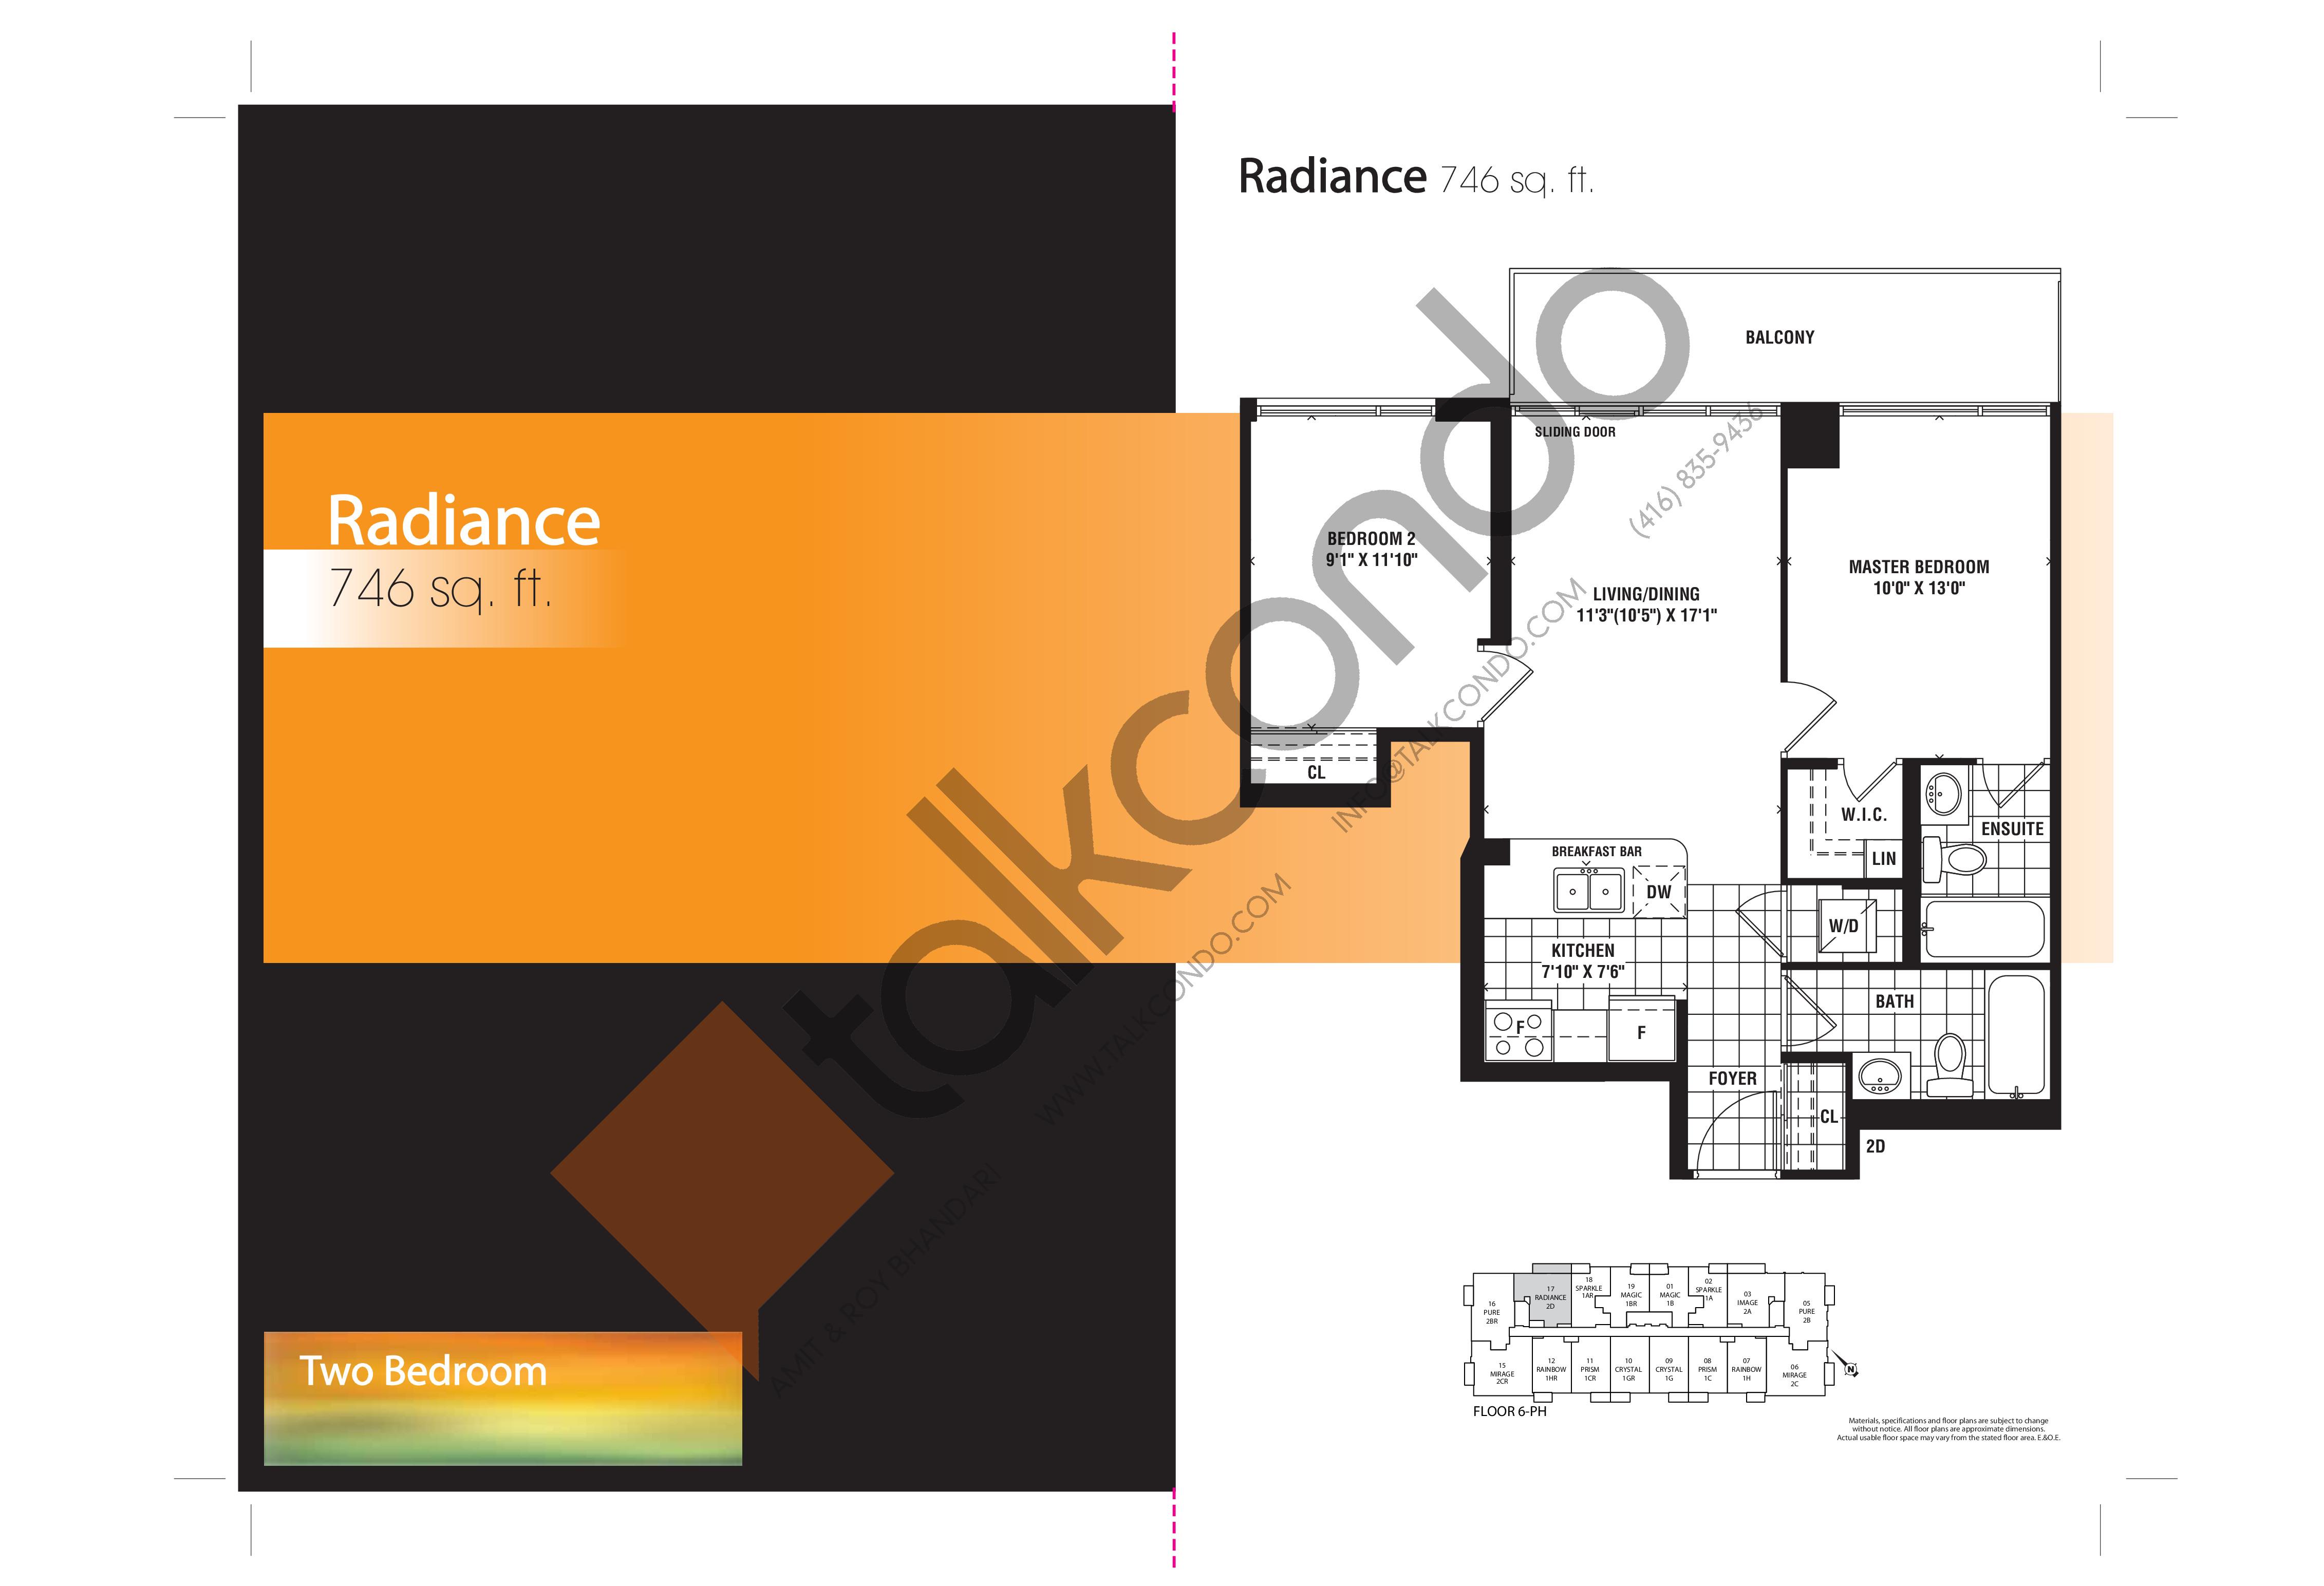 Radiance Floor Plan at Mirage Condos - 746 sq.ft